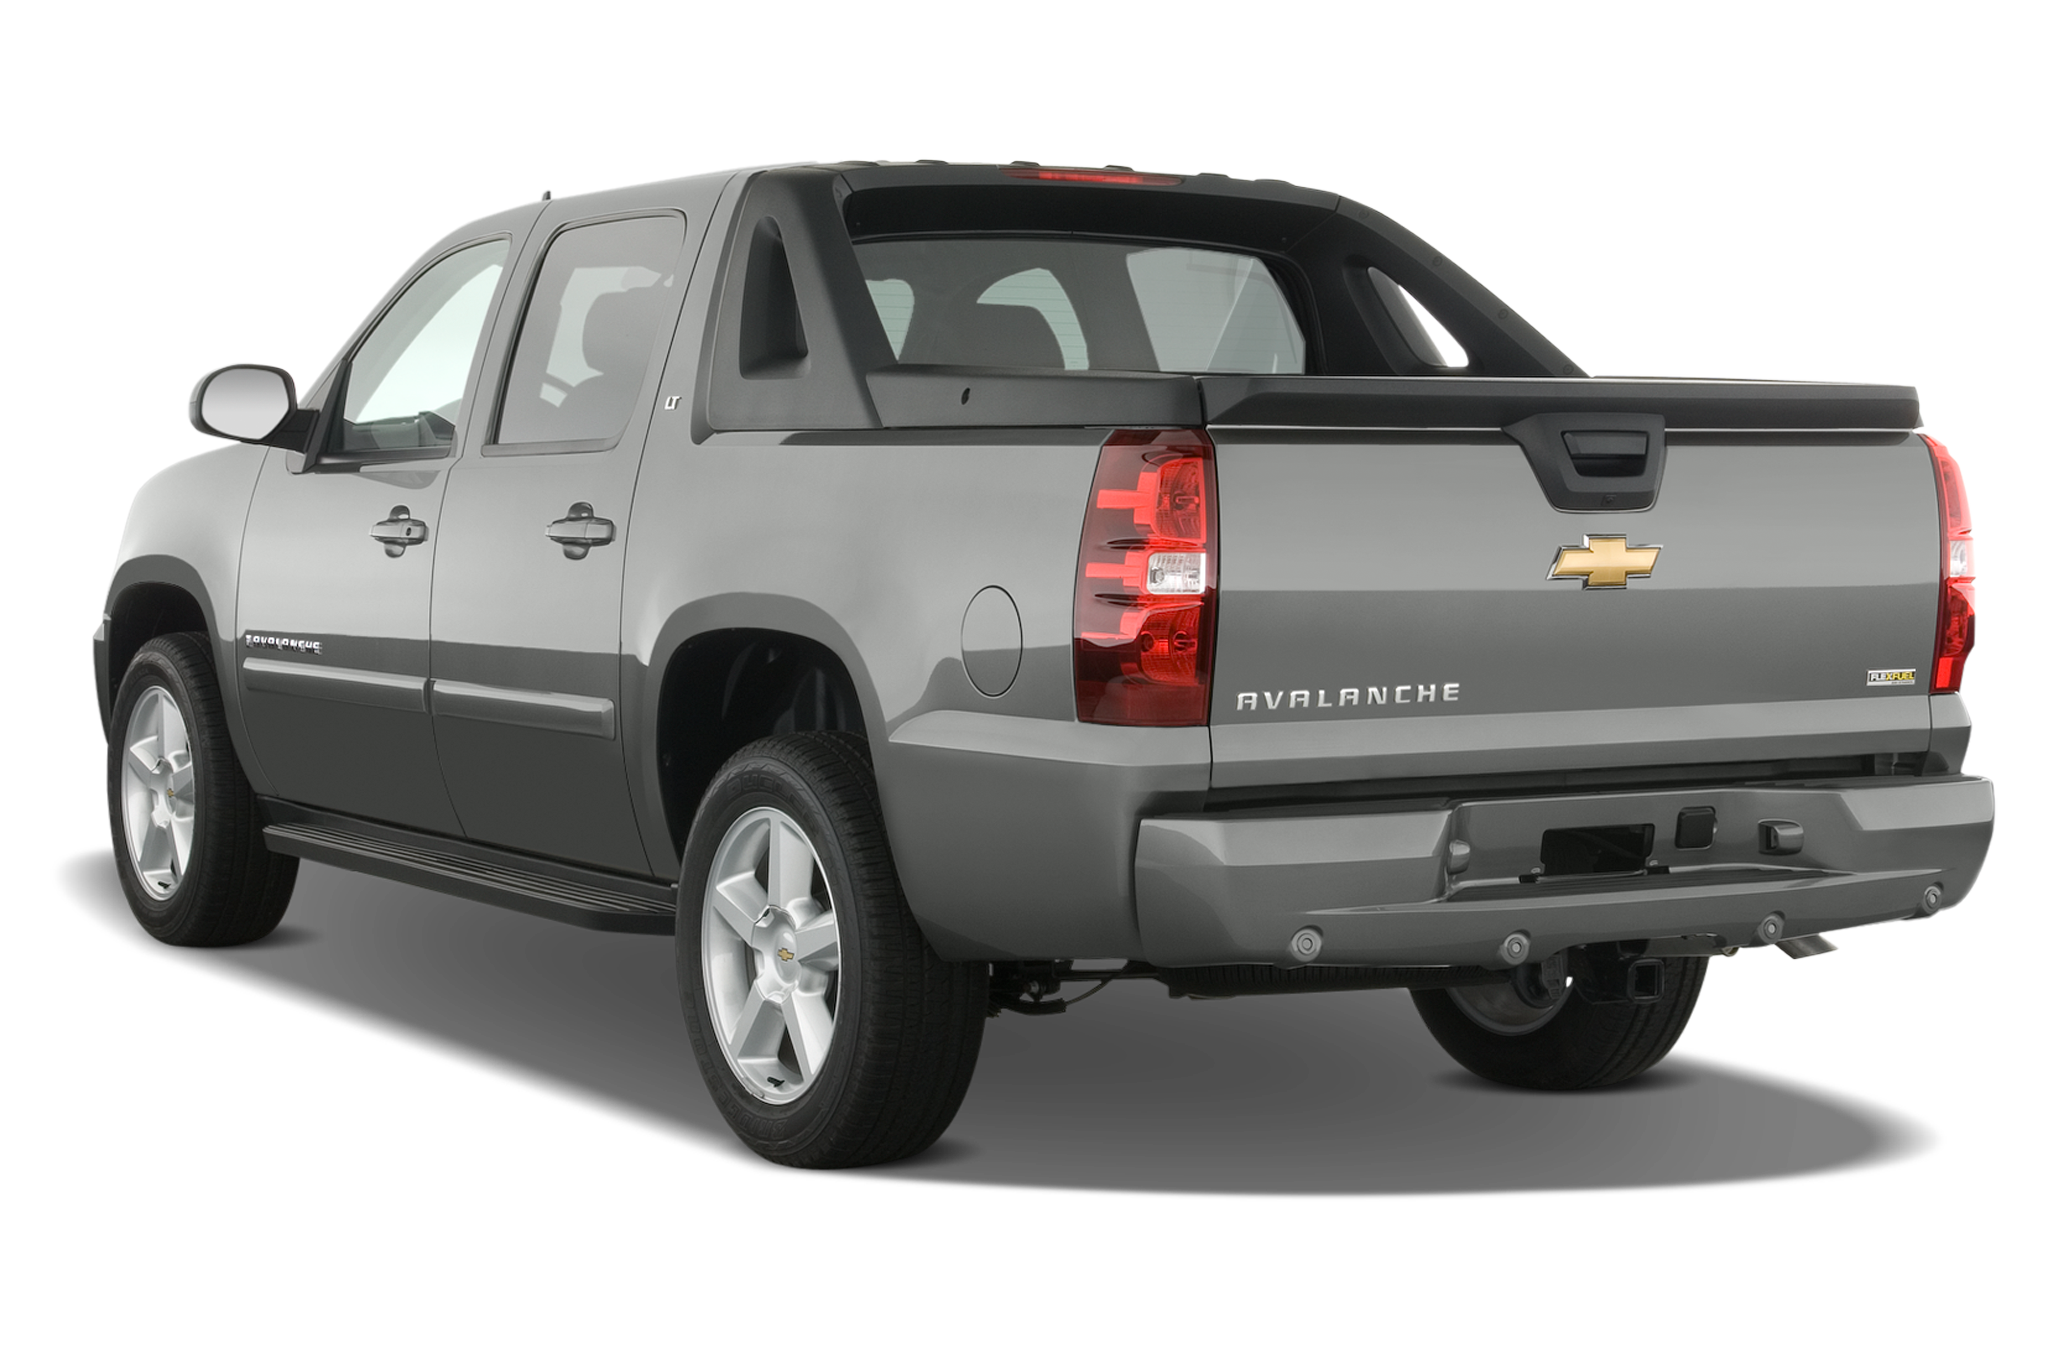 Chevrolet Avalanche II 2006 - 2013 Pickup #4